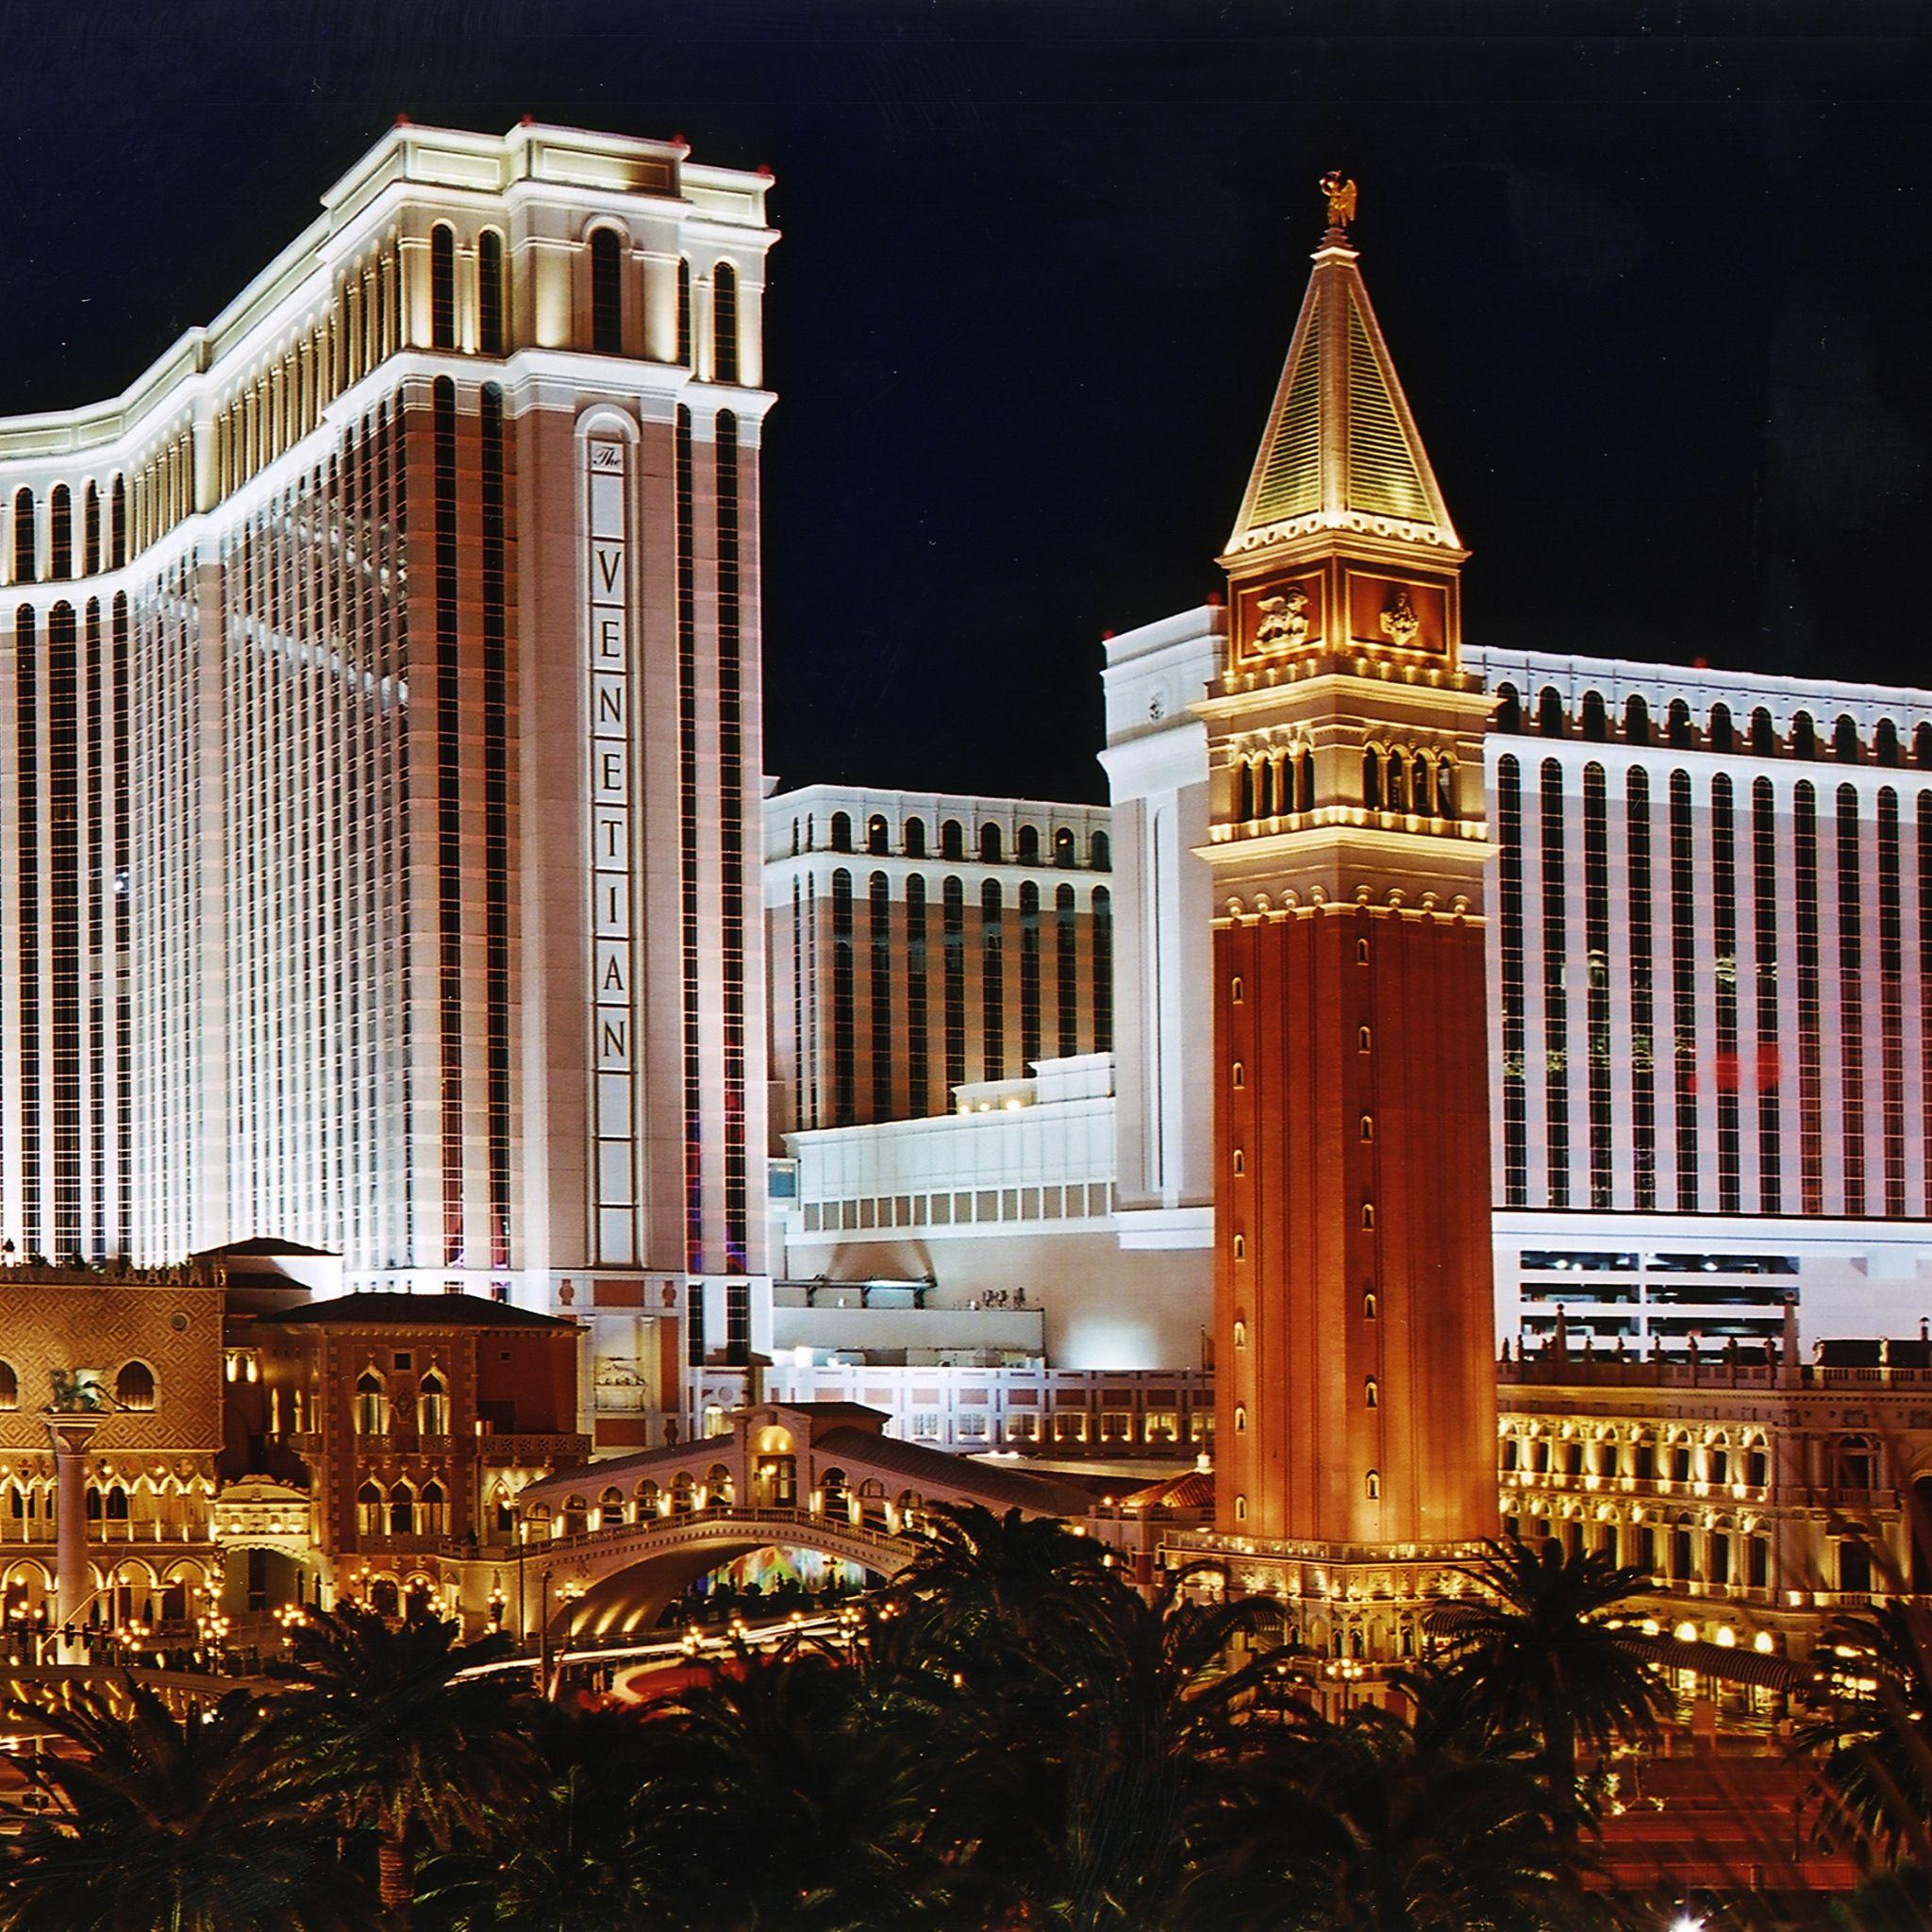 The venetian las vegas hotel deals - Accommodations Venetian Palazzo Las Vegas Hotel Bucket List Pinterest Hotel Suites Vegas And Palazzo Las Vegas